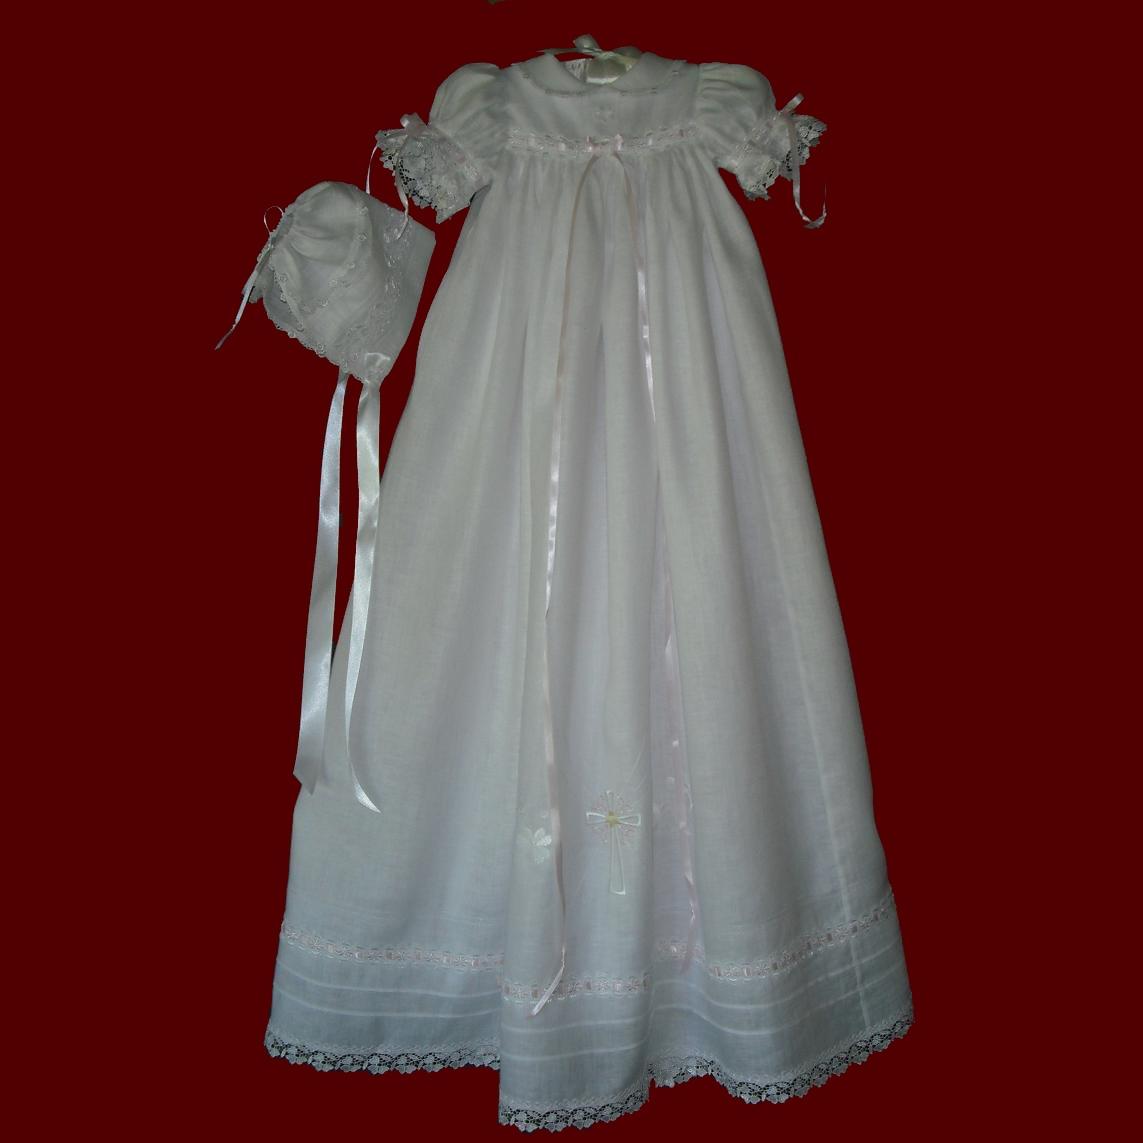 Shamrock Venice Lace Girls Christening Gown & Magic Hanky Bonnet ...